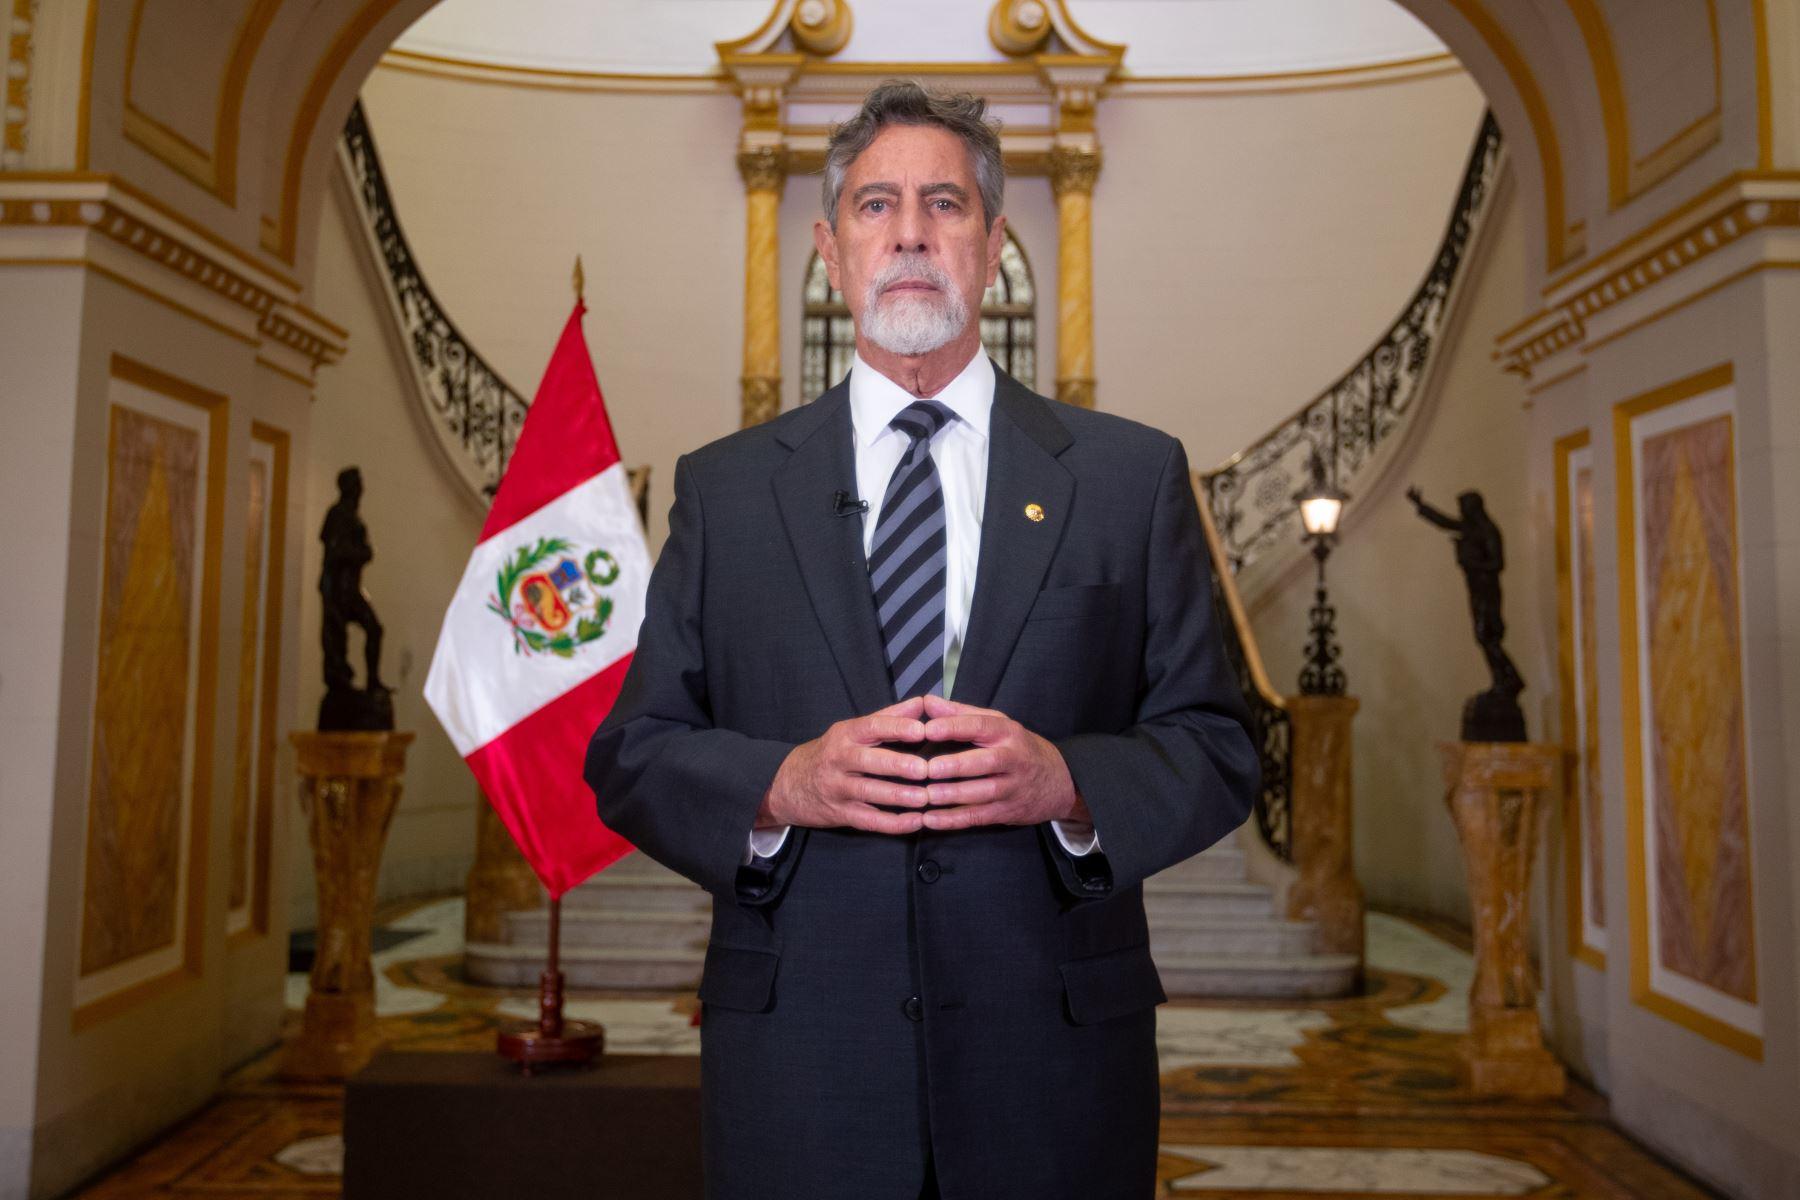 Peruvian President Francisco Sagasti